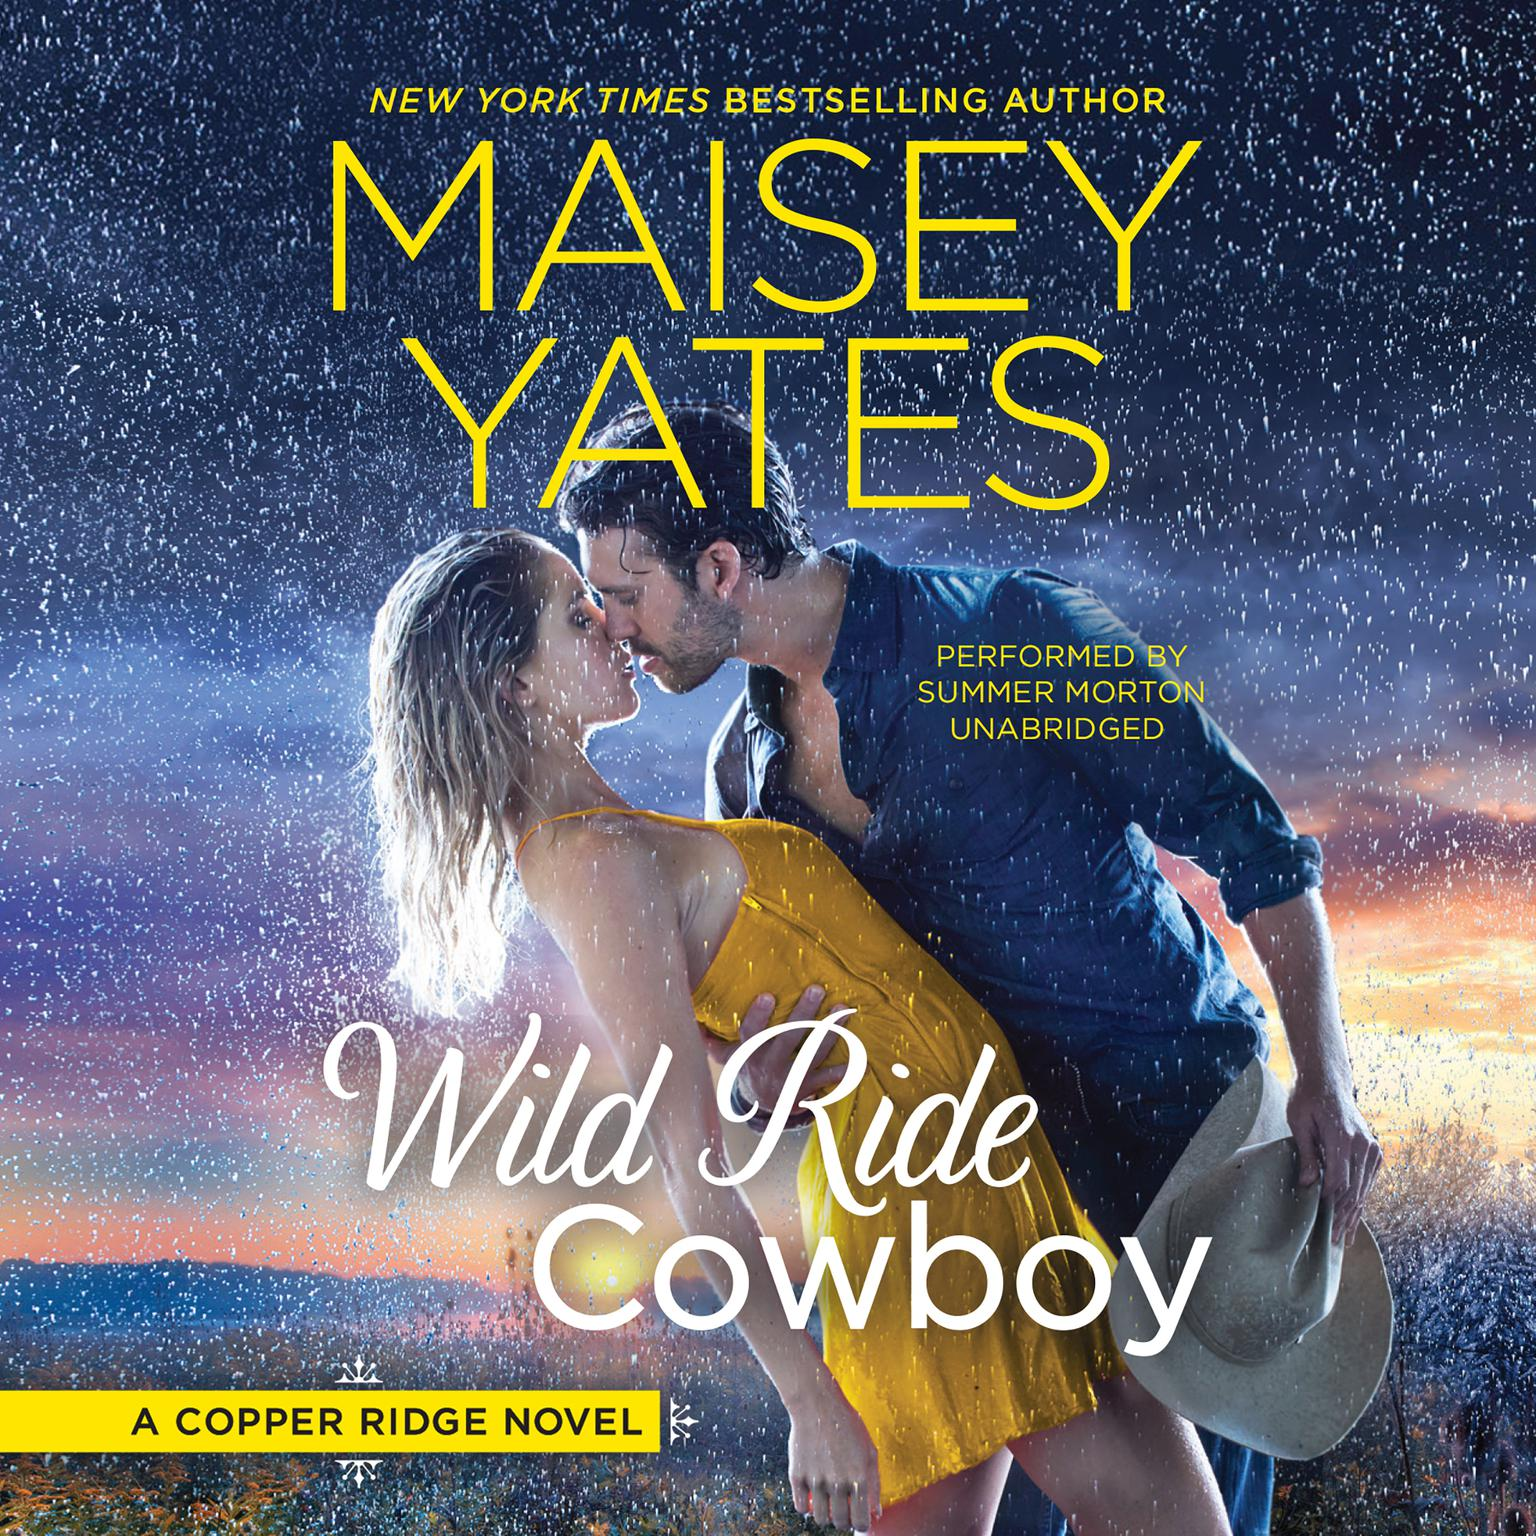 Wild Ride Cowboy: Copper Ridge Audiobook, by Maisey Yates